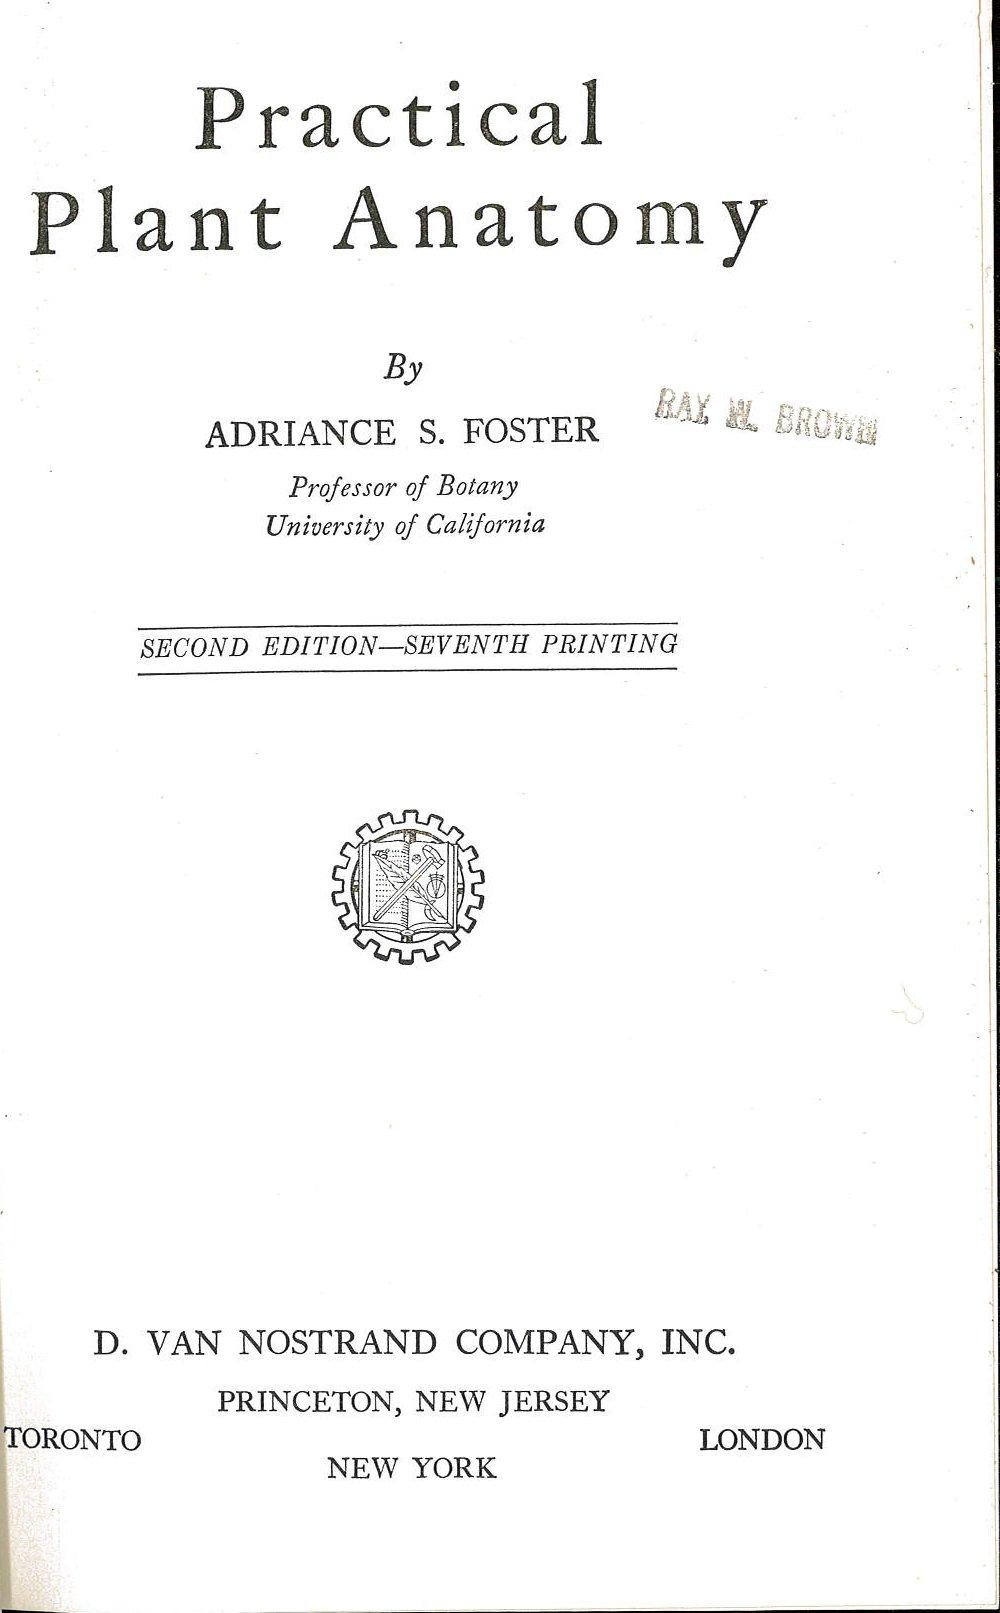 Practical Plant Anatomy: Adriance S. Foster: 9780442024284: Amazon ...